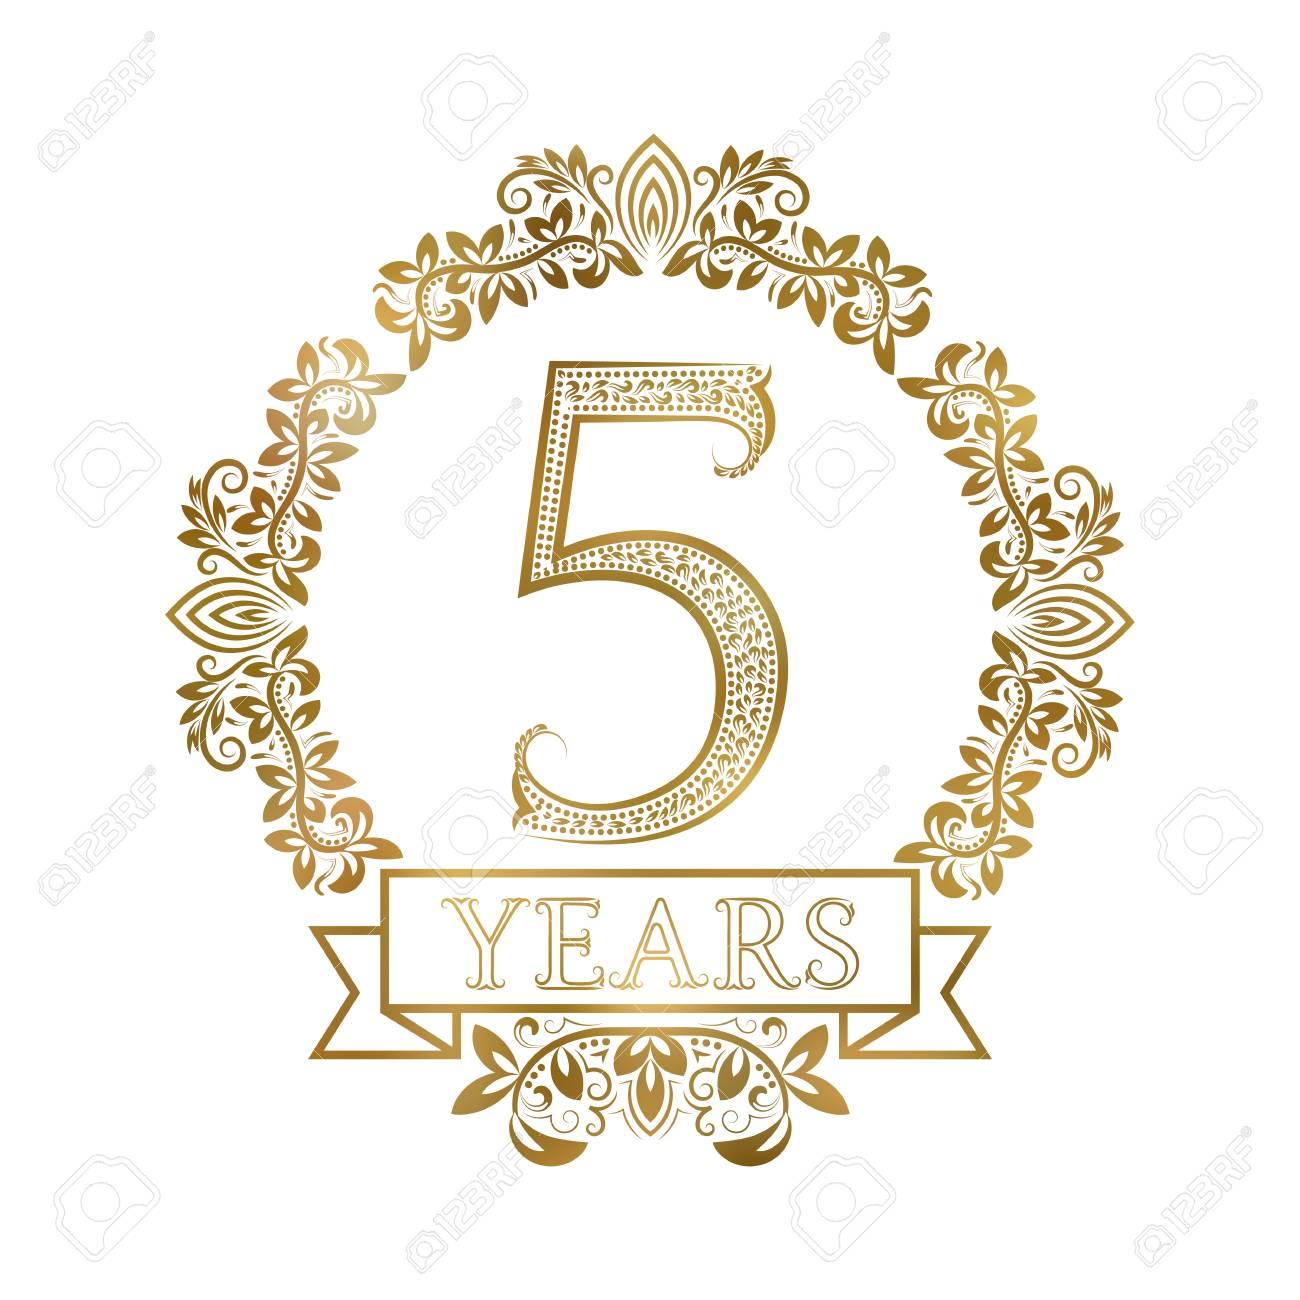 Cinco Anos Aniversario Celebracion Oro Vintage Logotipo Etiqueta De